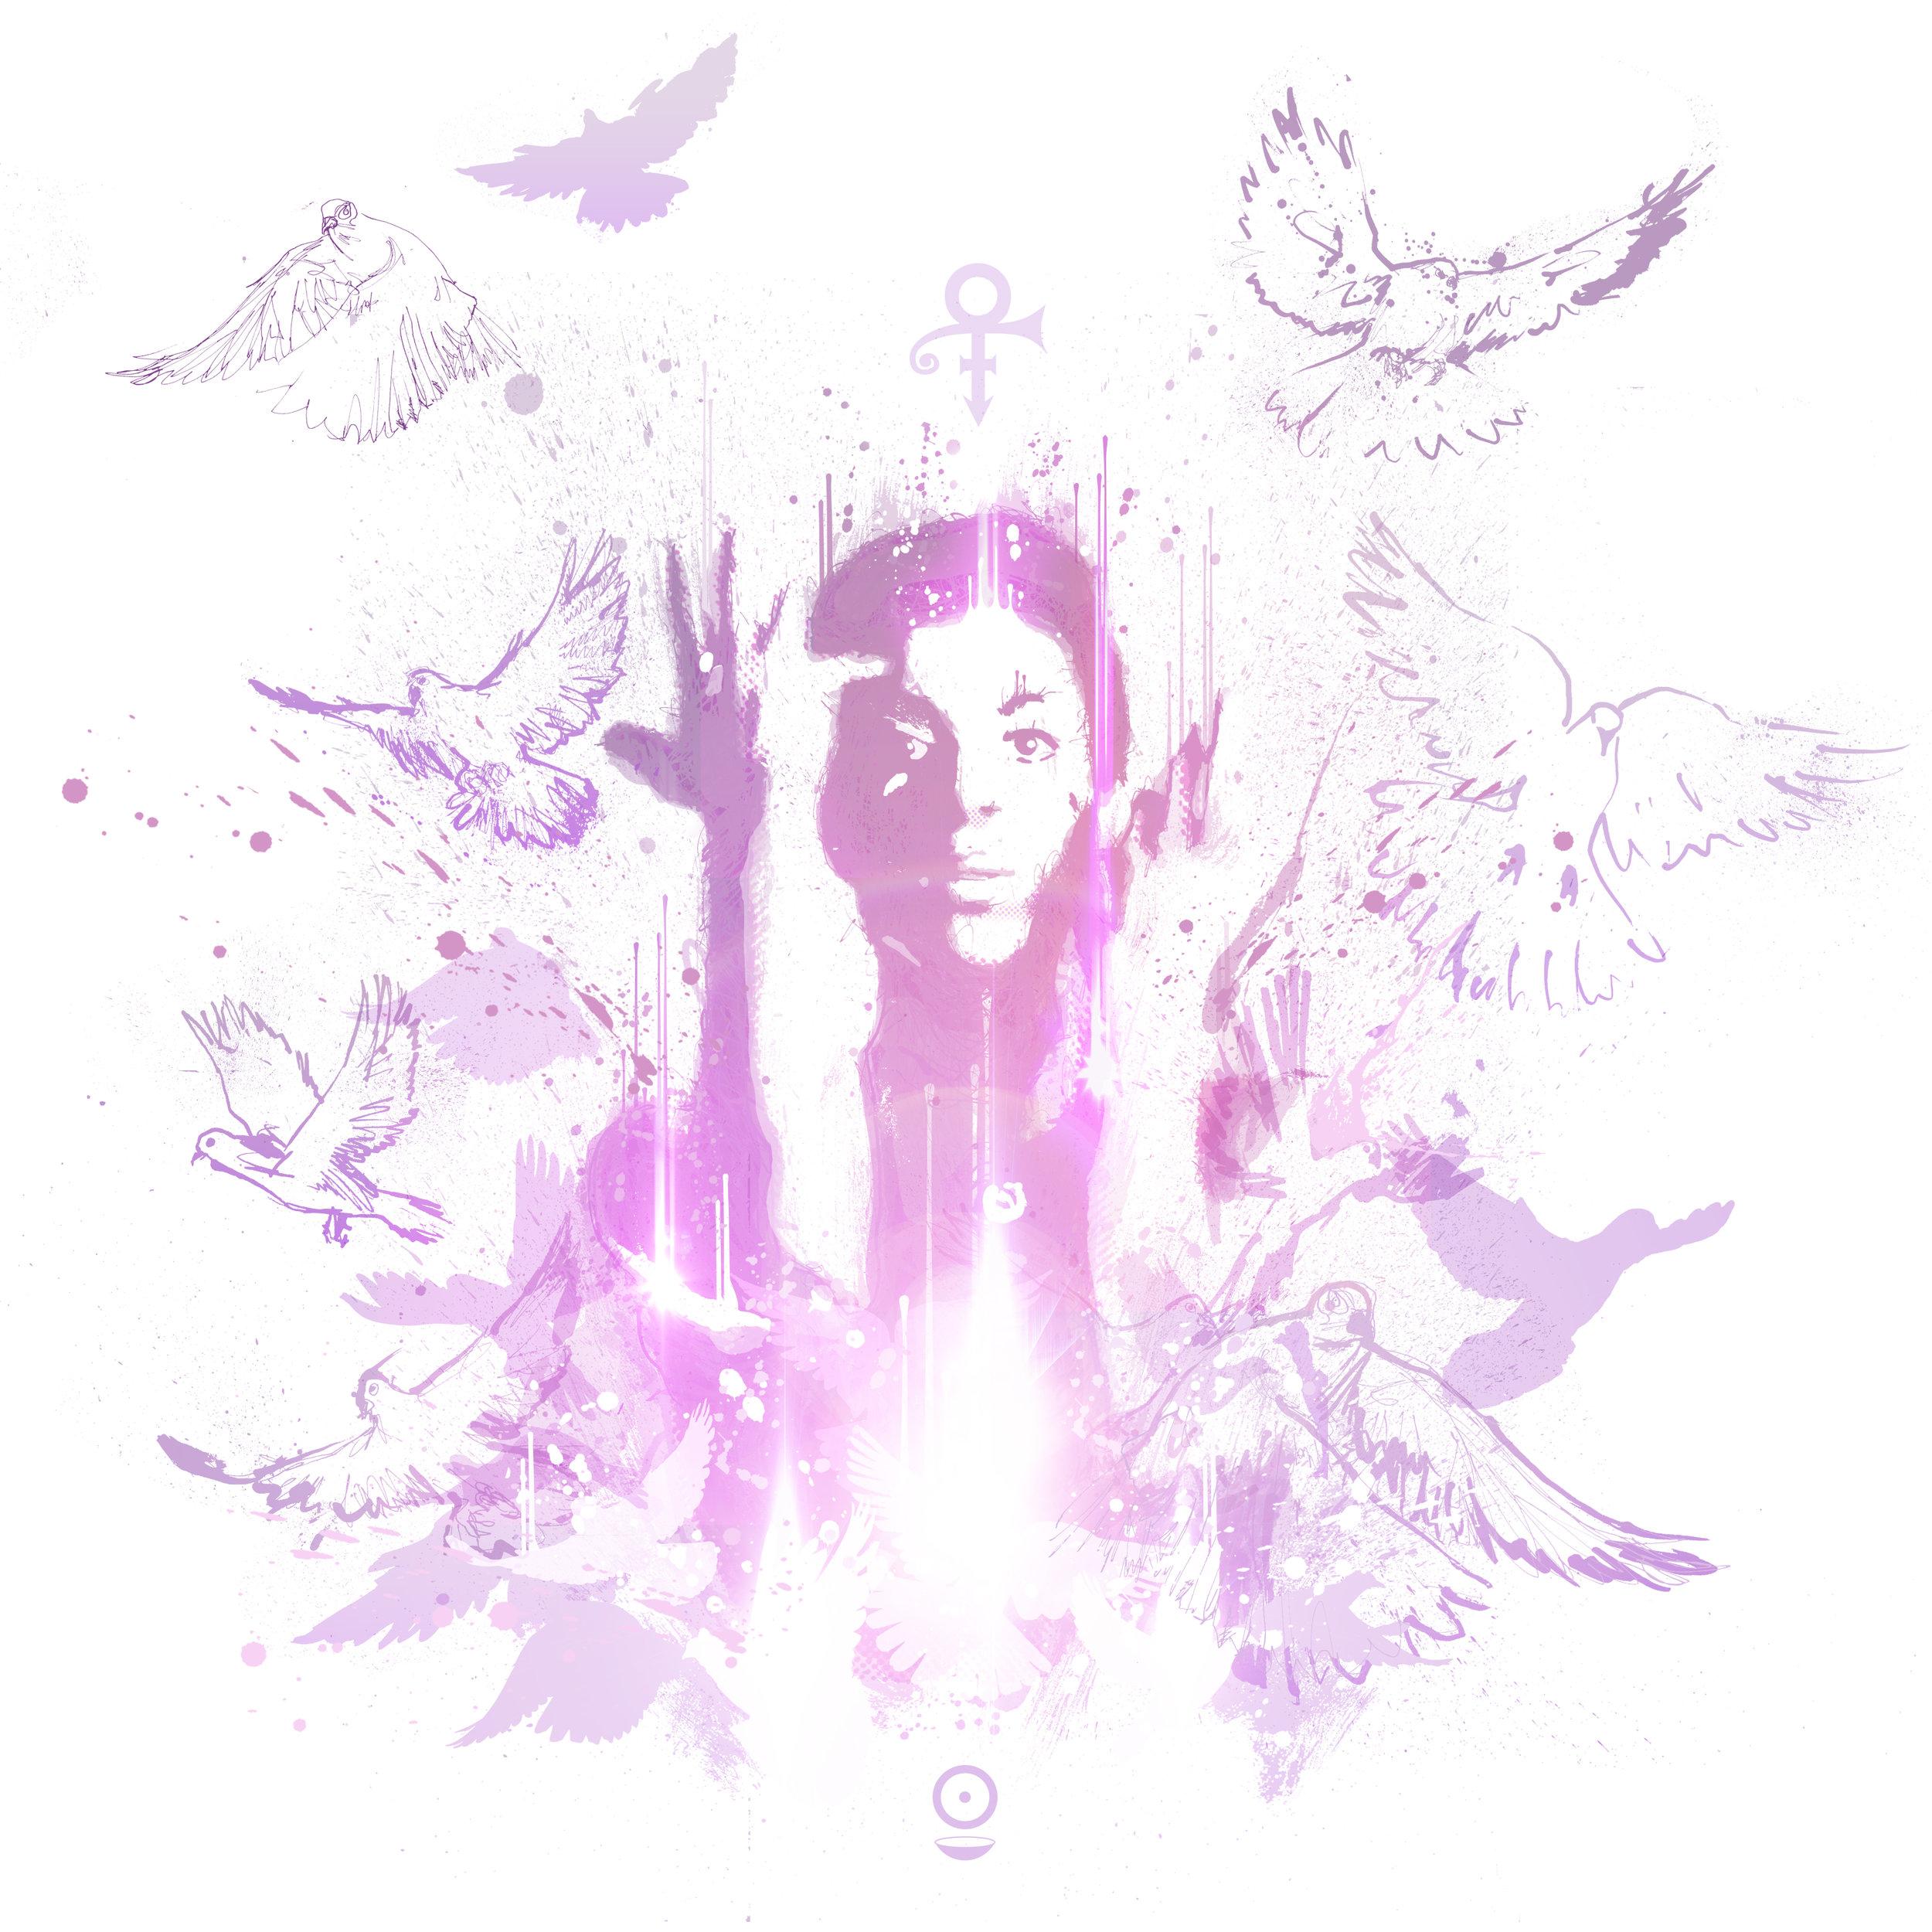 Prince_PurpleReign_Large.jpg